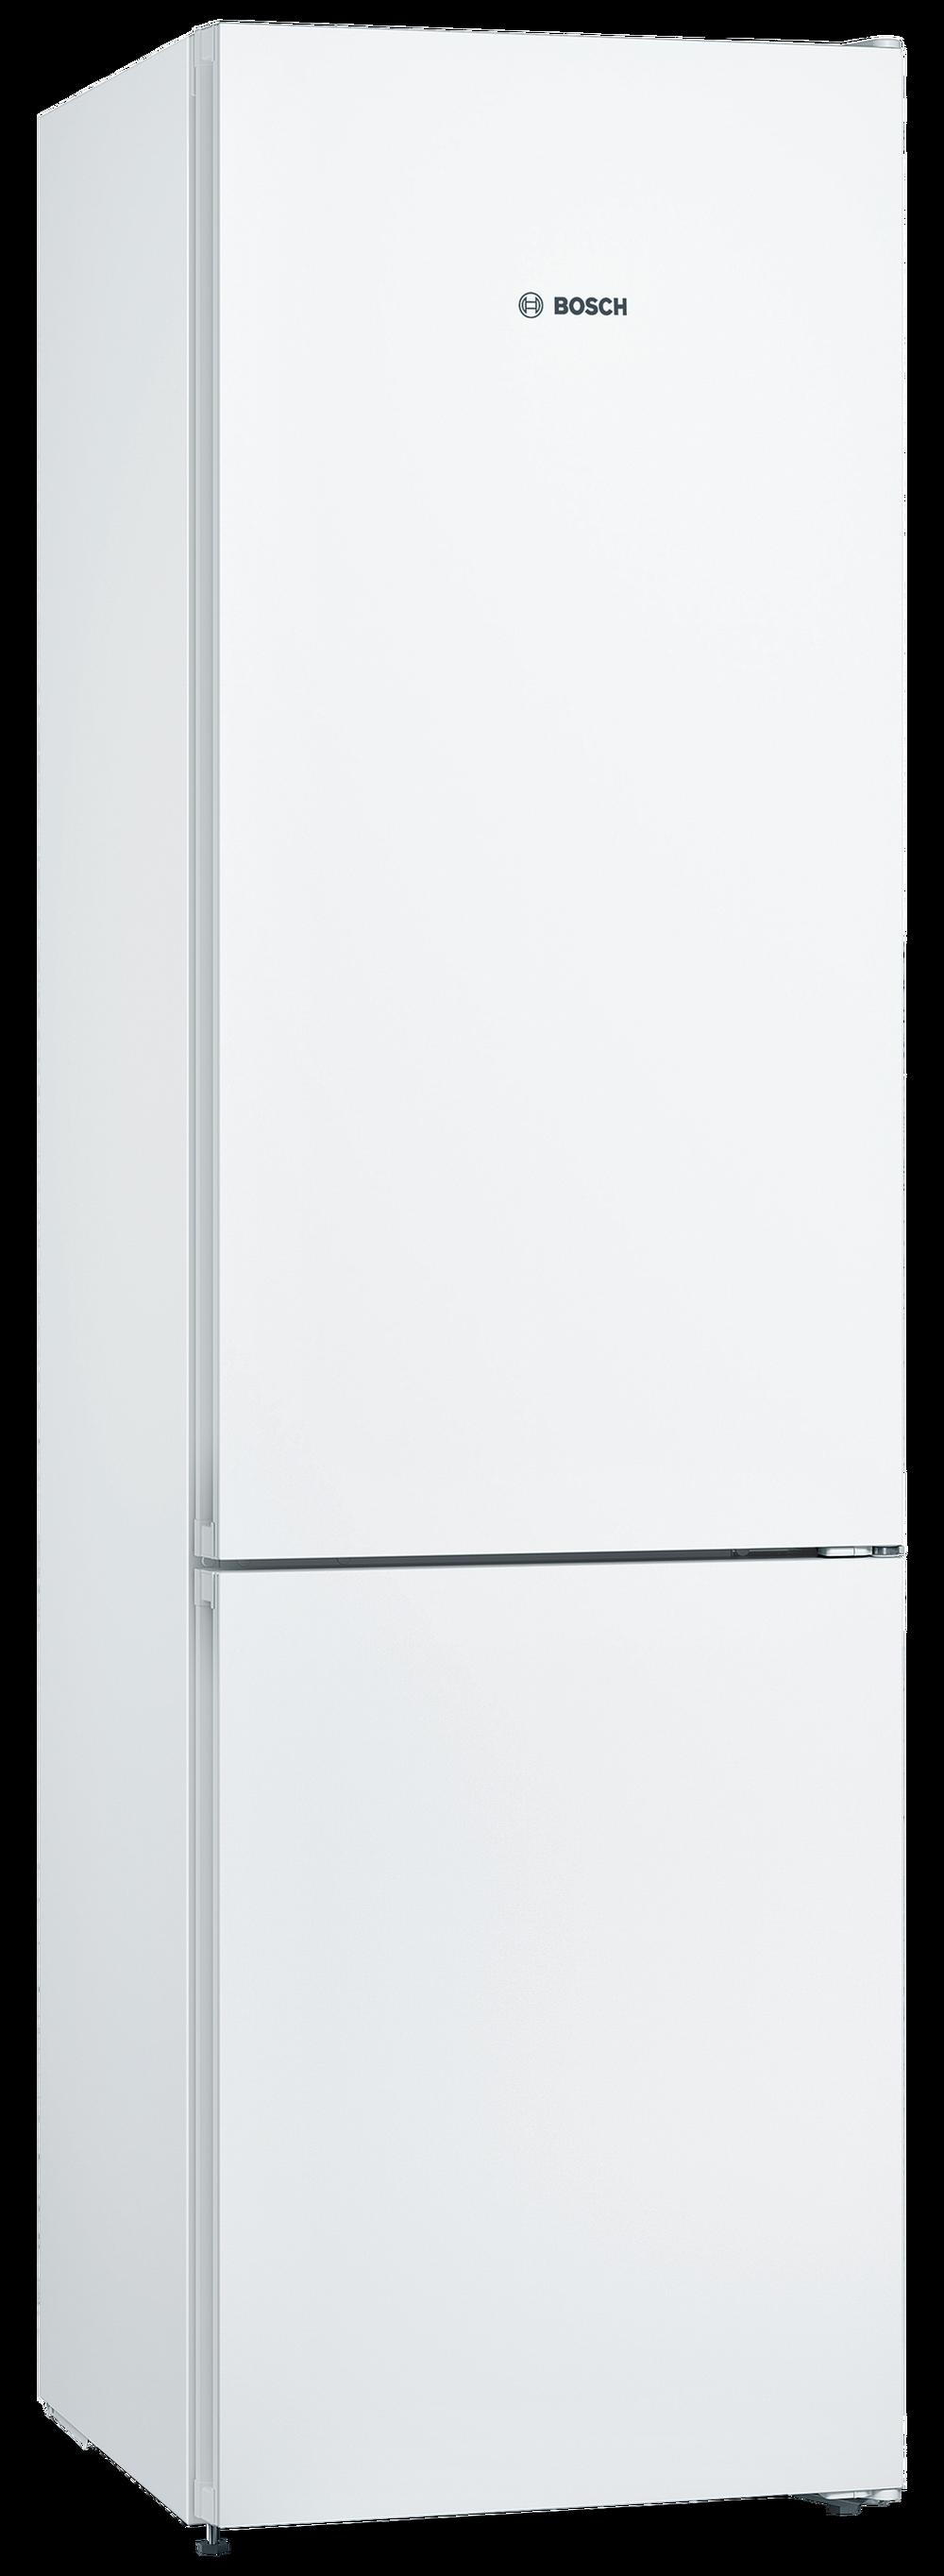 Bosch Serie 4 KGN39VWEAG 279 Litre A++ Rated White Fridge Freezer